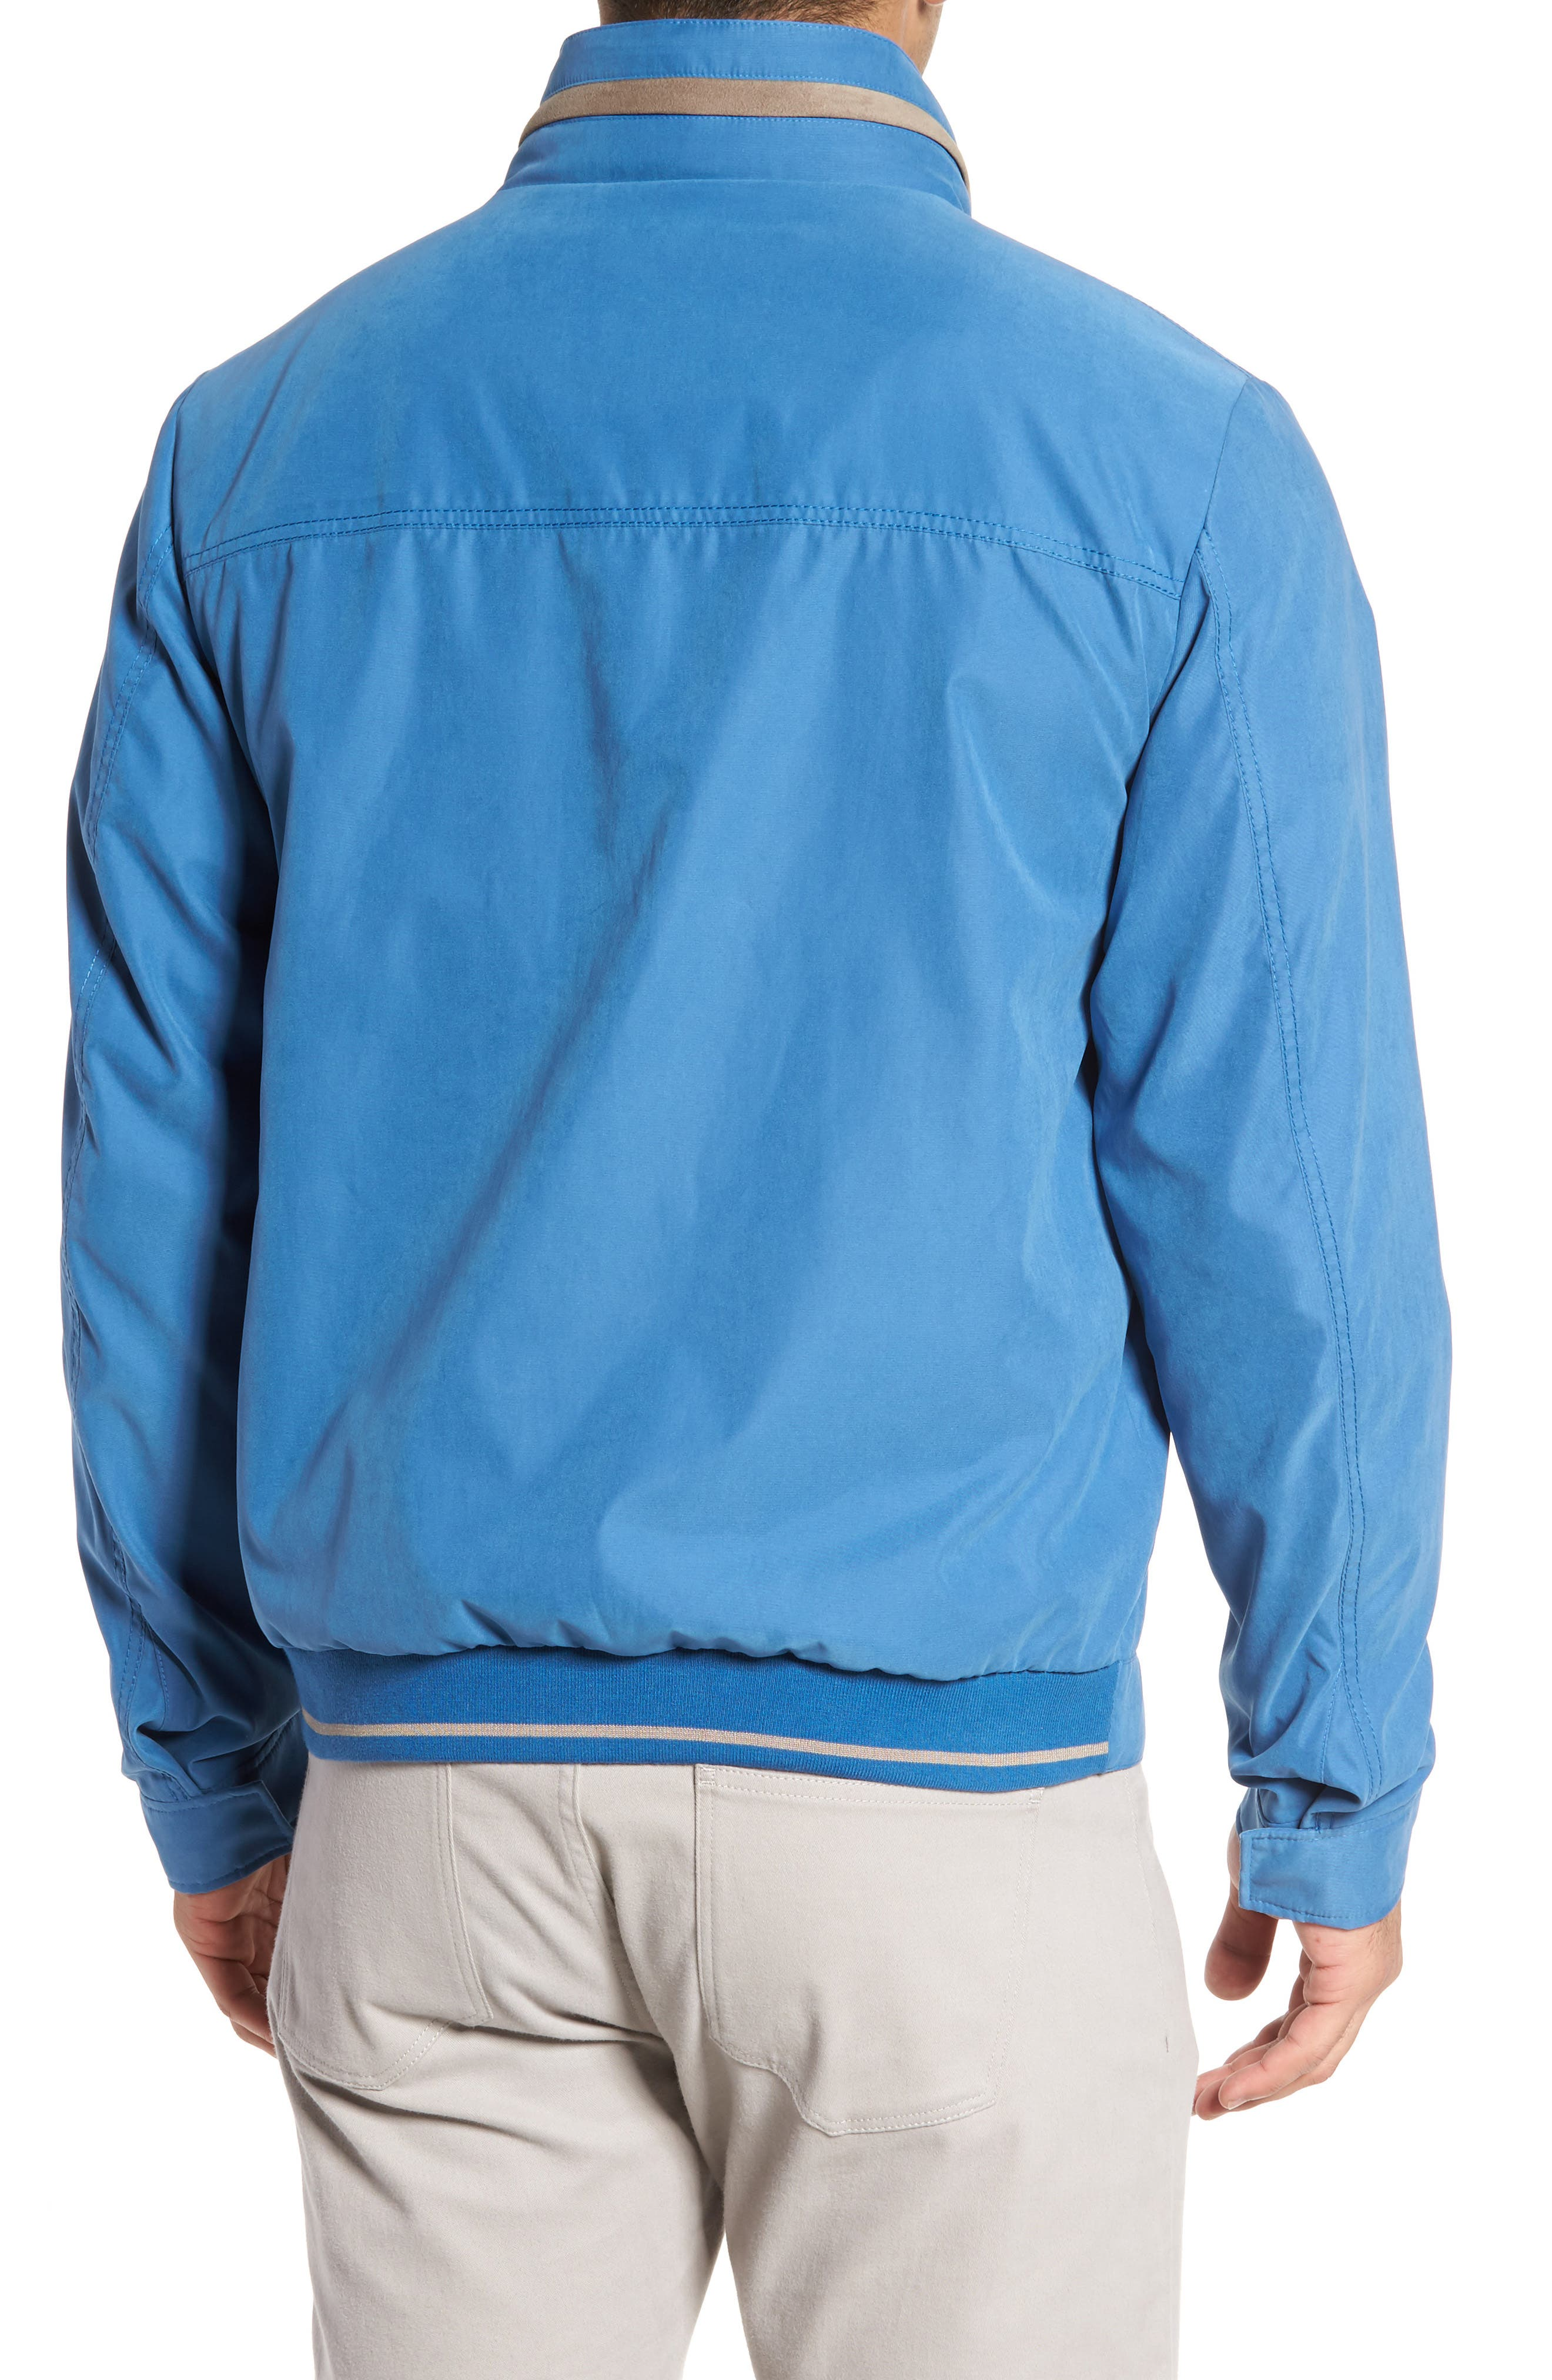 Alternate Image 2  - Paul & Shark Water Repellent Microfiber Jacket